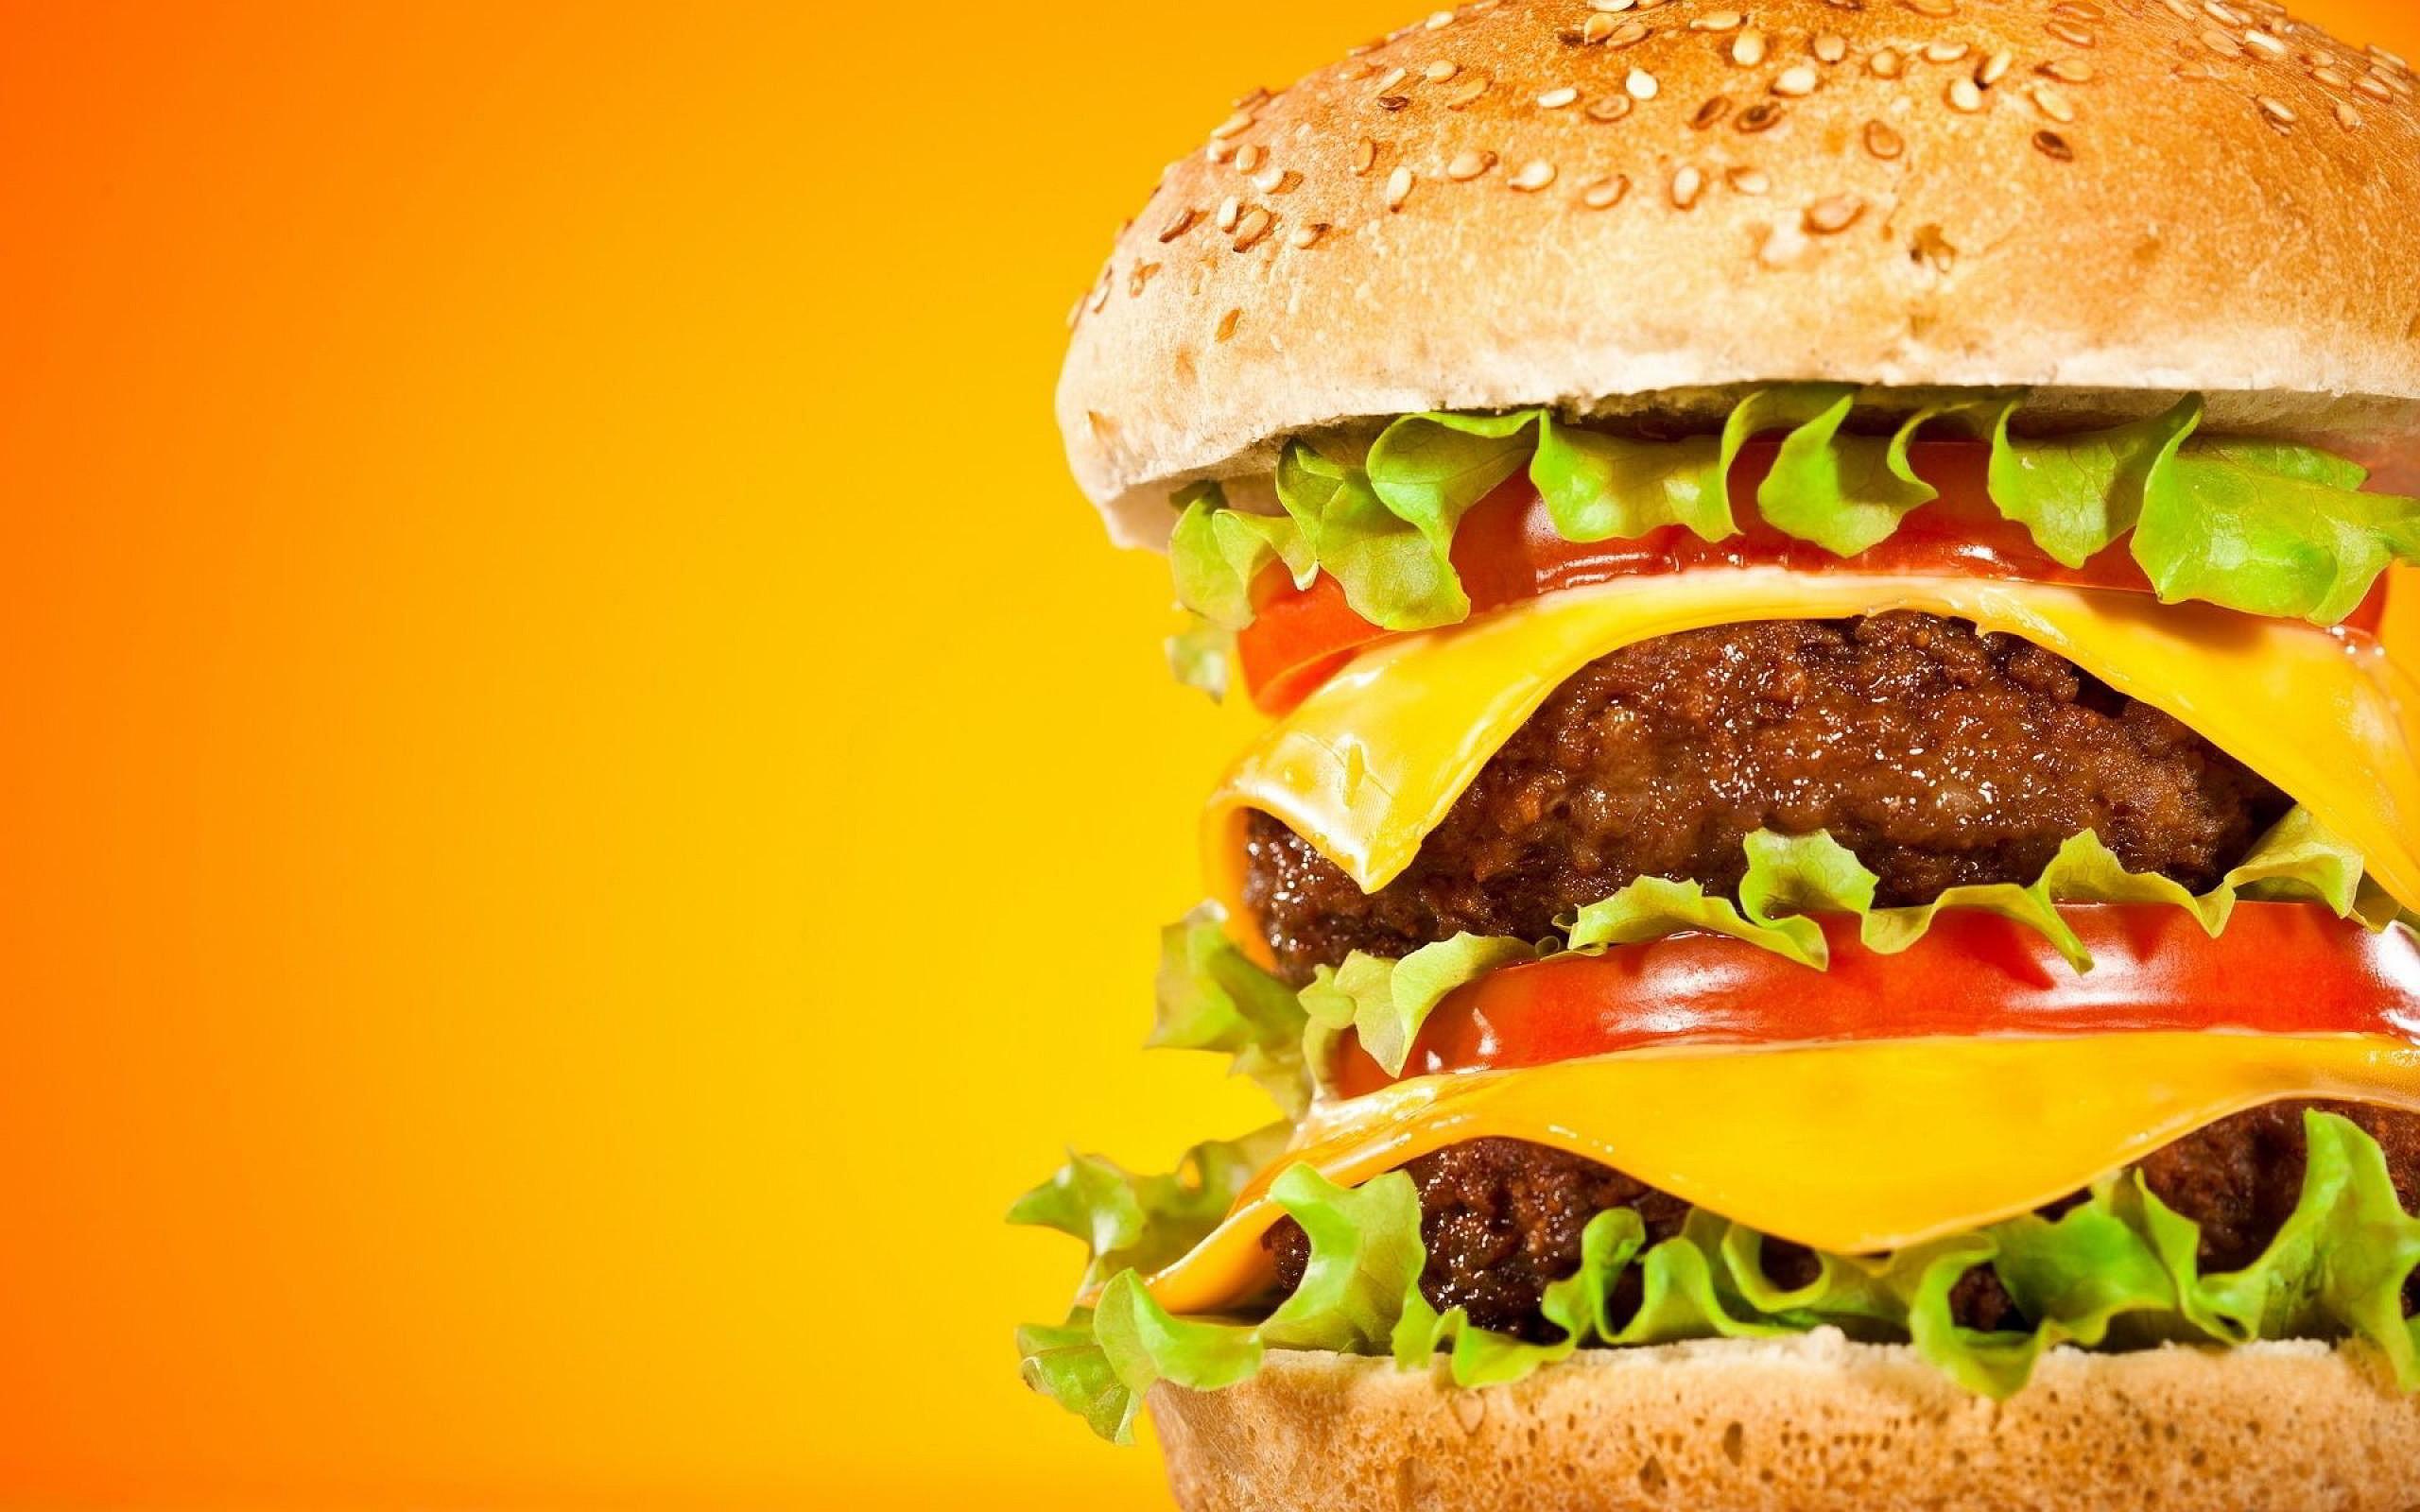 2304 Cheeseburger Wallpaper HD